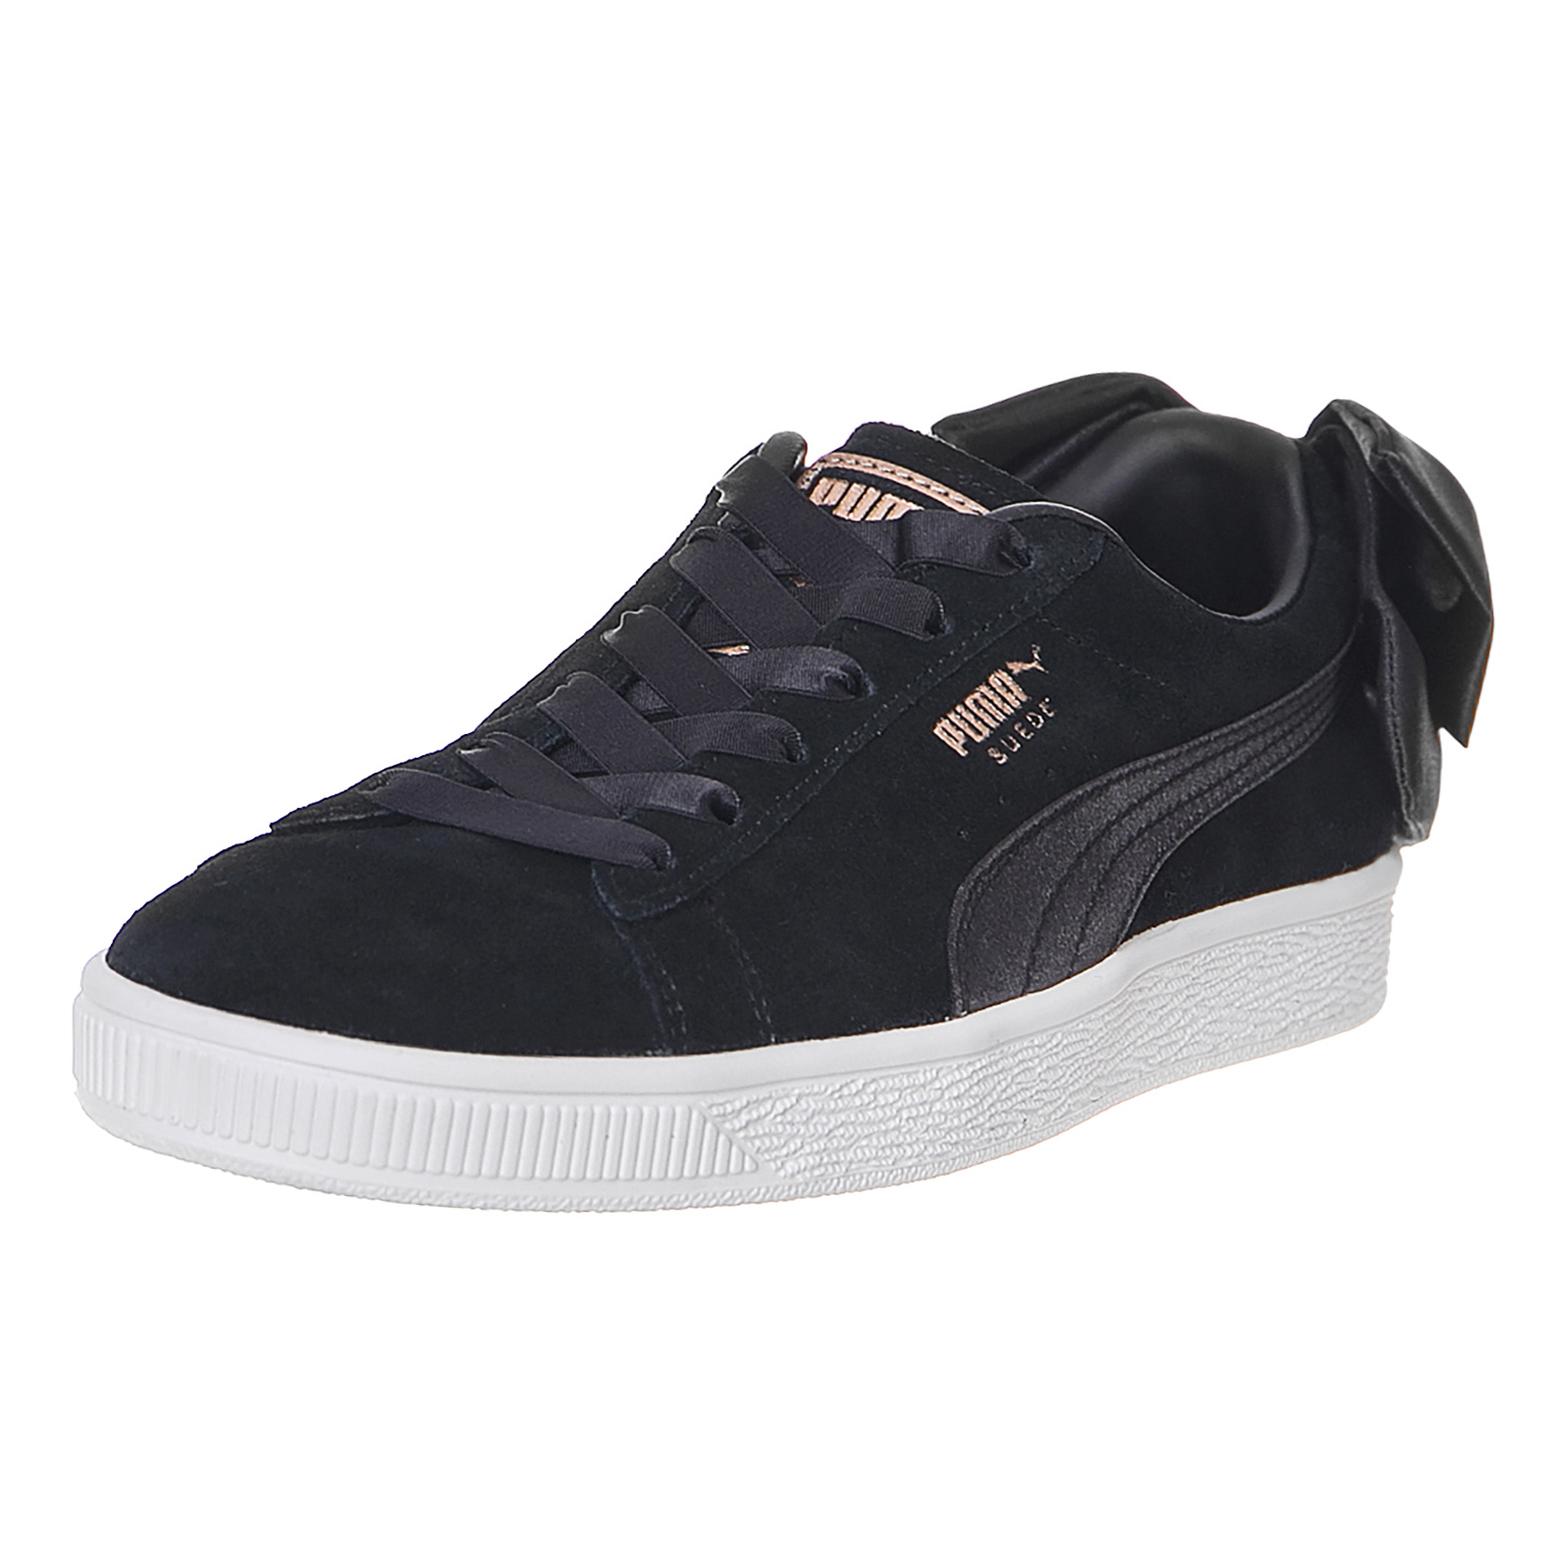 Puma Sneakers Suede Bow Wn S puma Puma Black black black